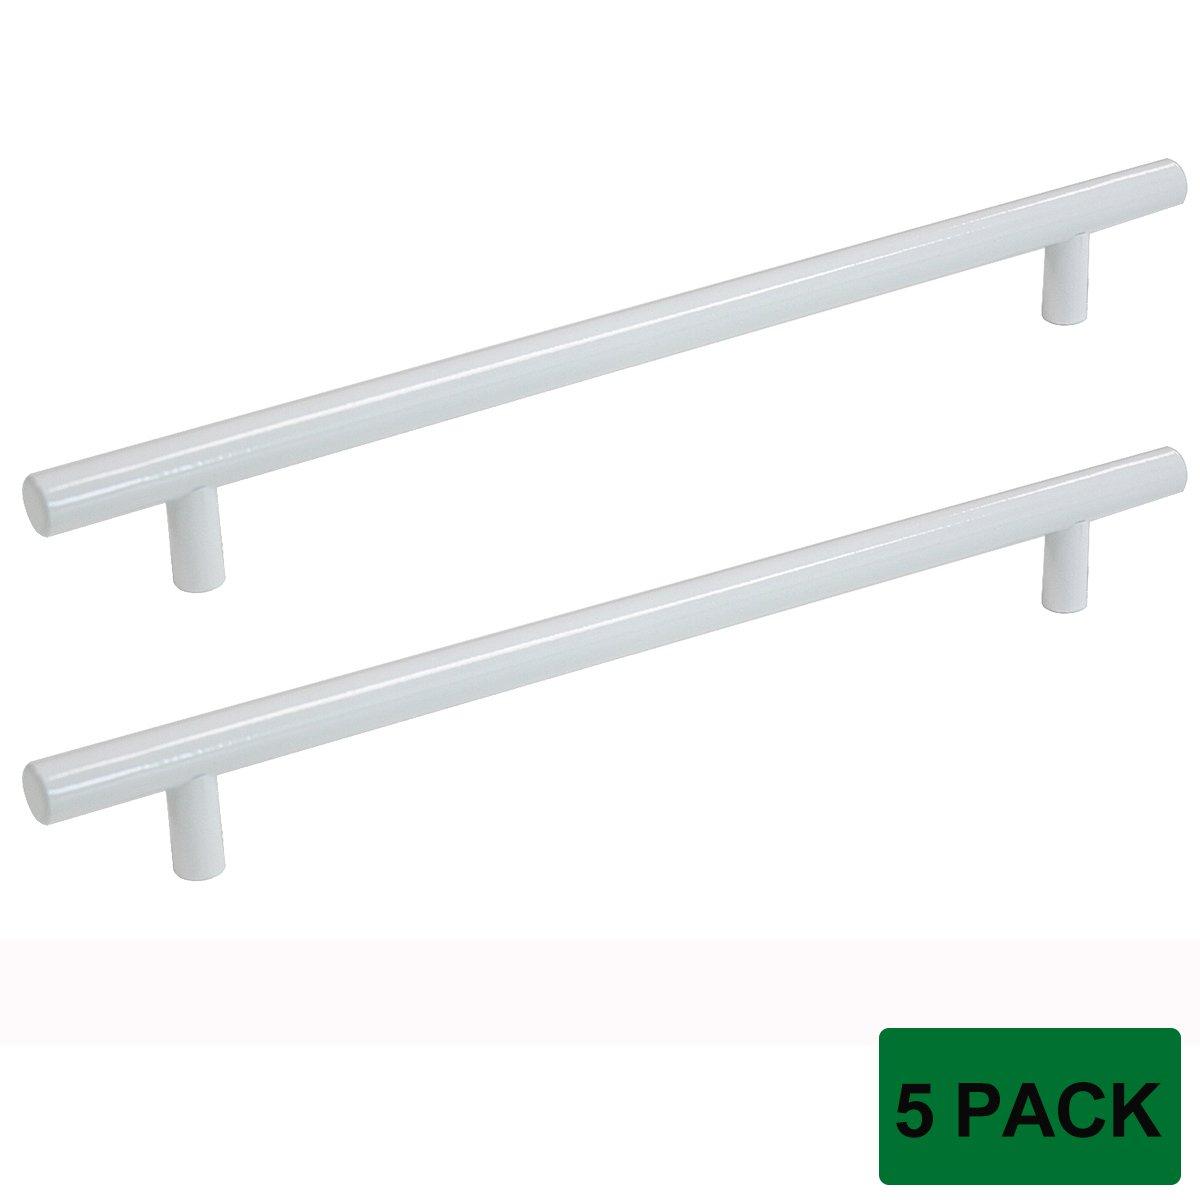 Probrico Modern Cabinet Hardware Dresser Cupboard Handle Pull White Kitchen Cabinet T Bar Knobs Stainless Steel- 12mm Diameter - 8-3/4 Hole Spacing - 5 Pack